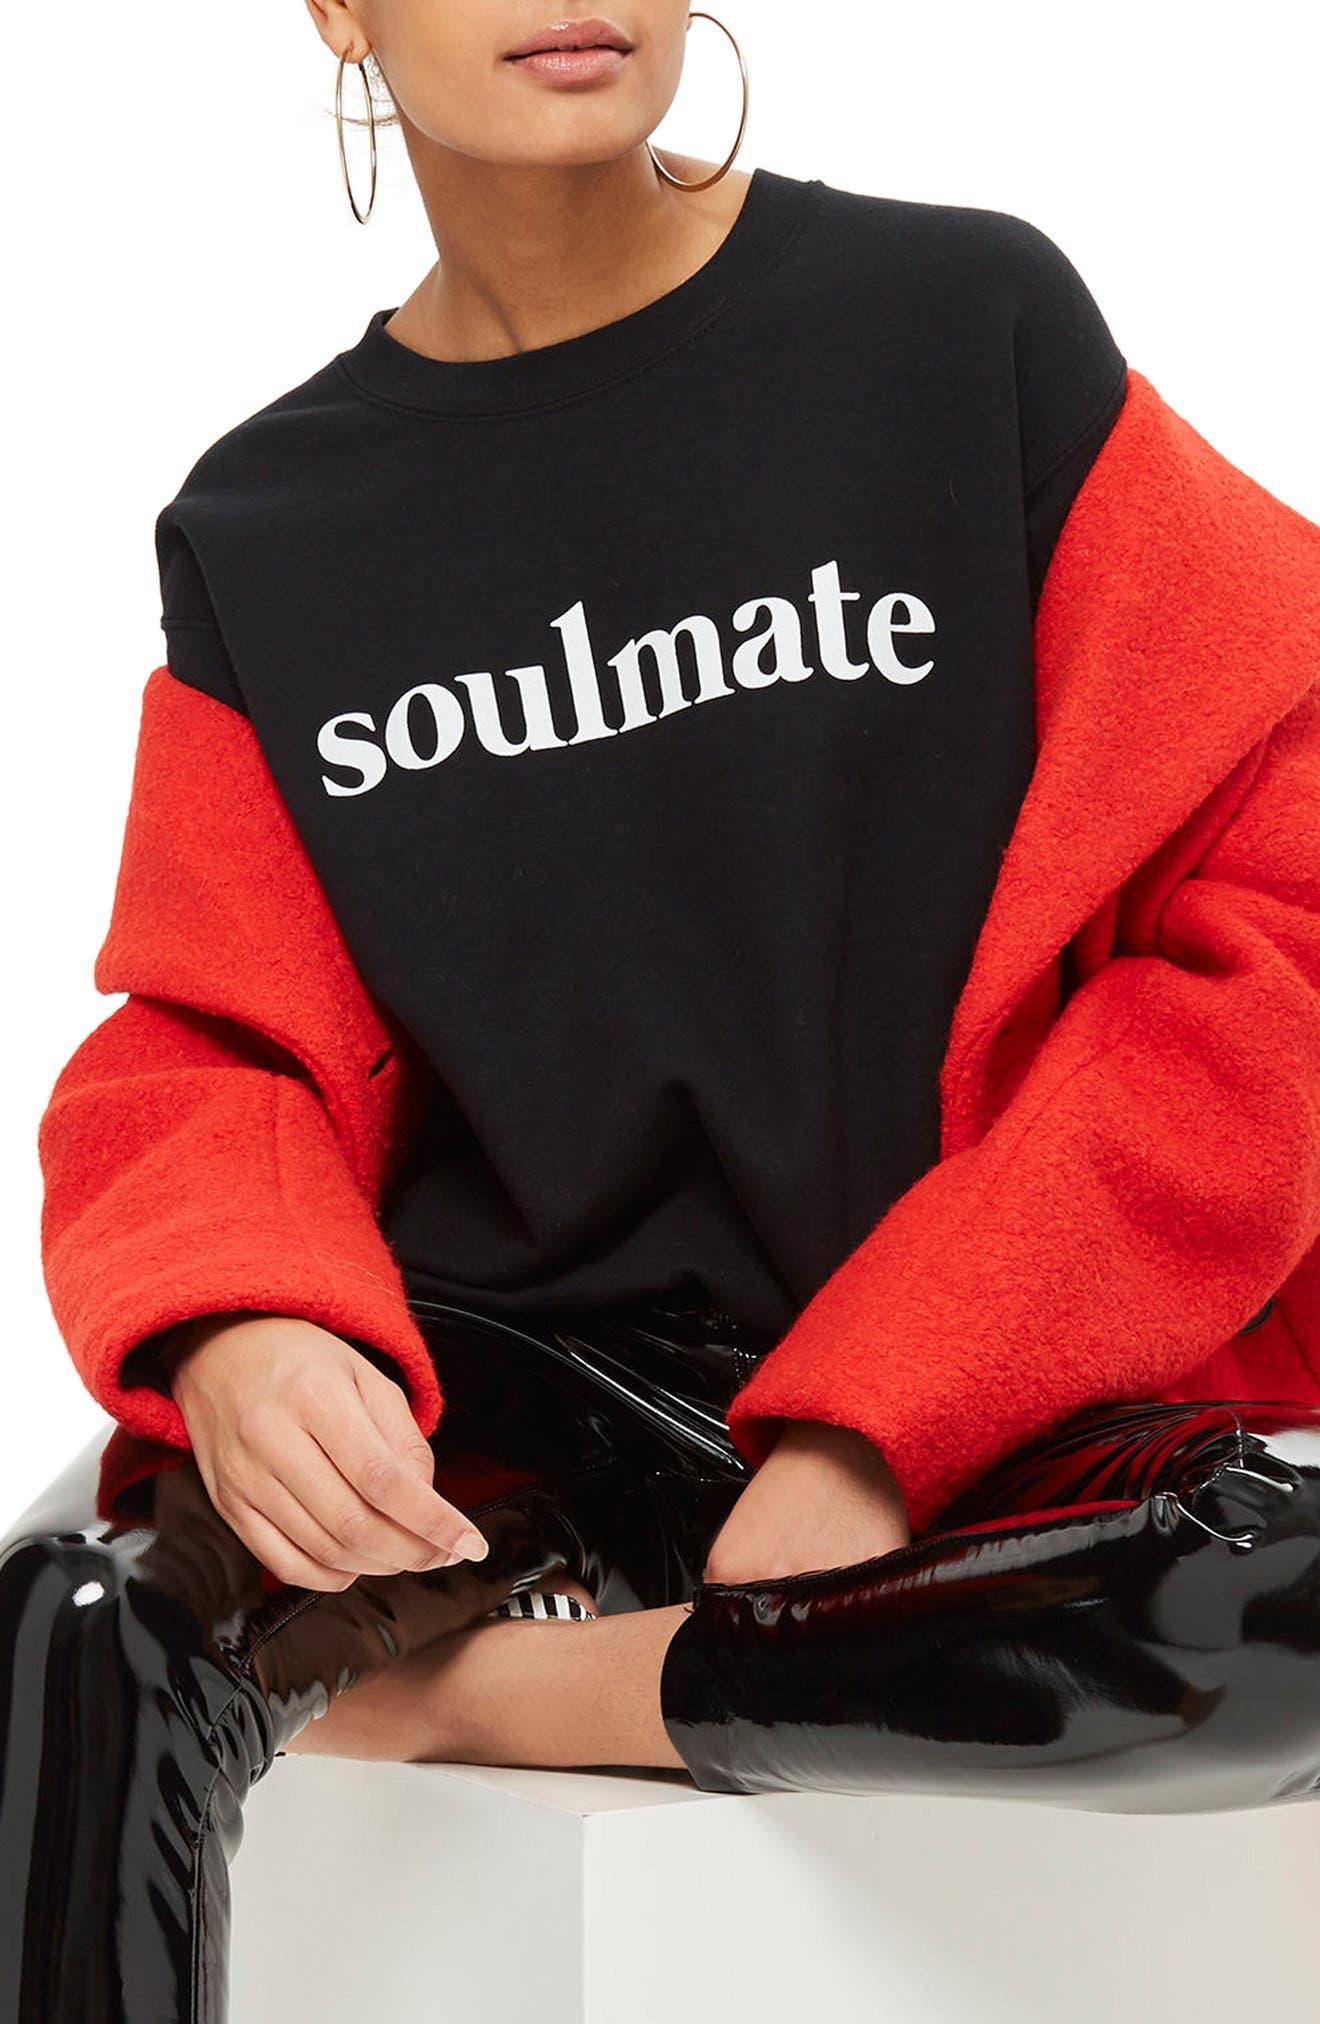 Soulmate Graphic Sweatshirt,                             Alternate thumbnail 4, color,                             Black Multi